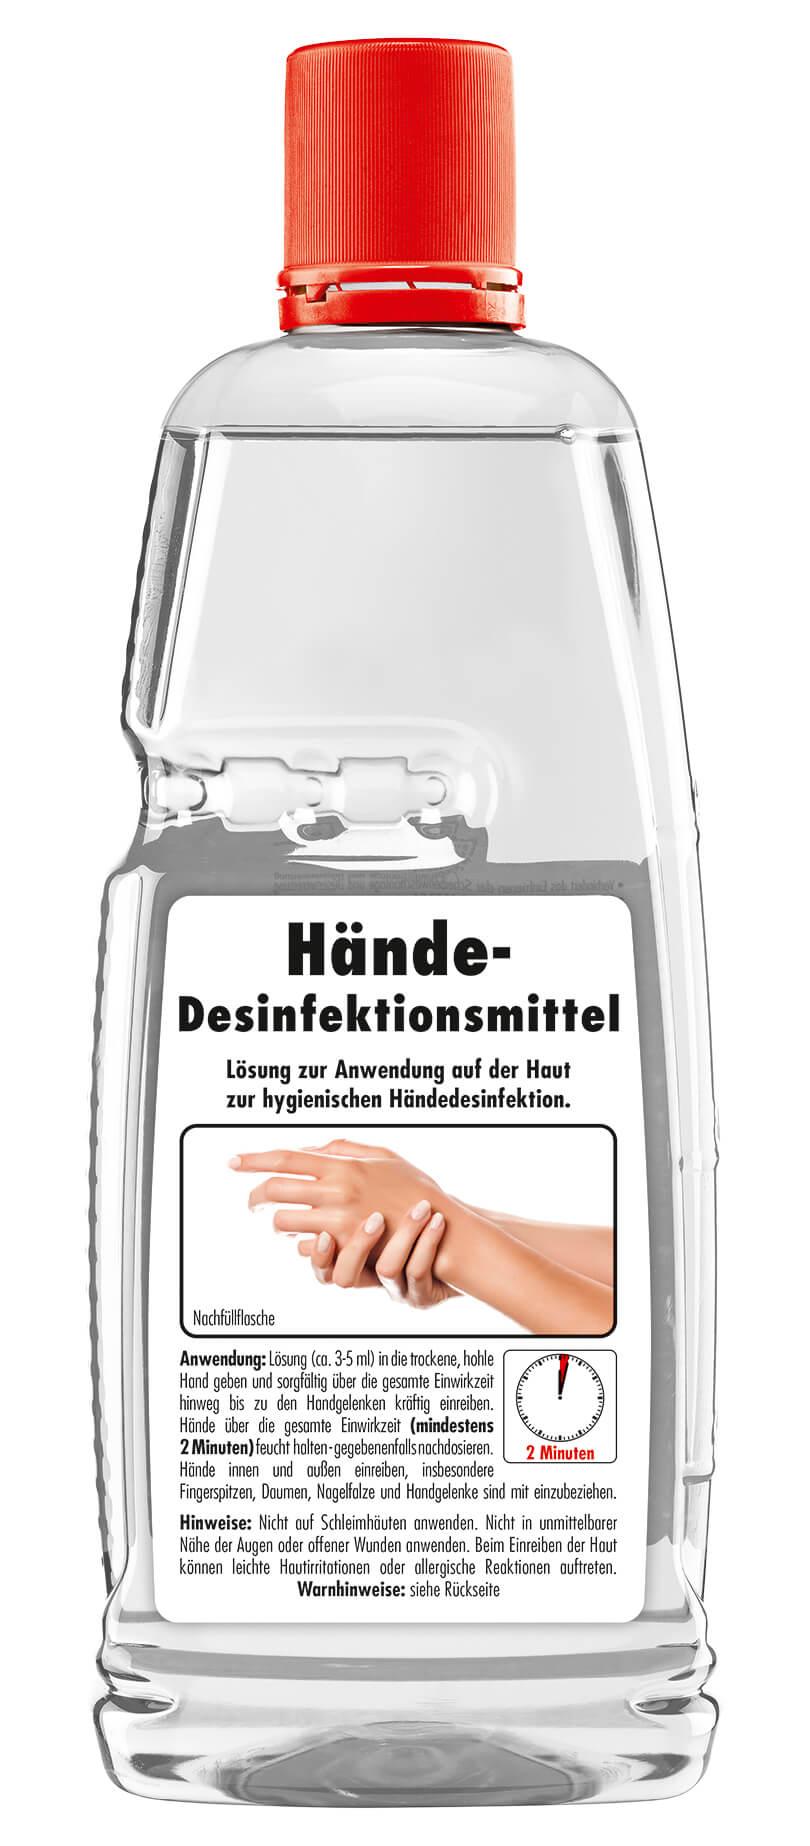 Handedesinfektion Myxal Sept Gel 1000 Ml Variofl 4260029171839